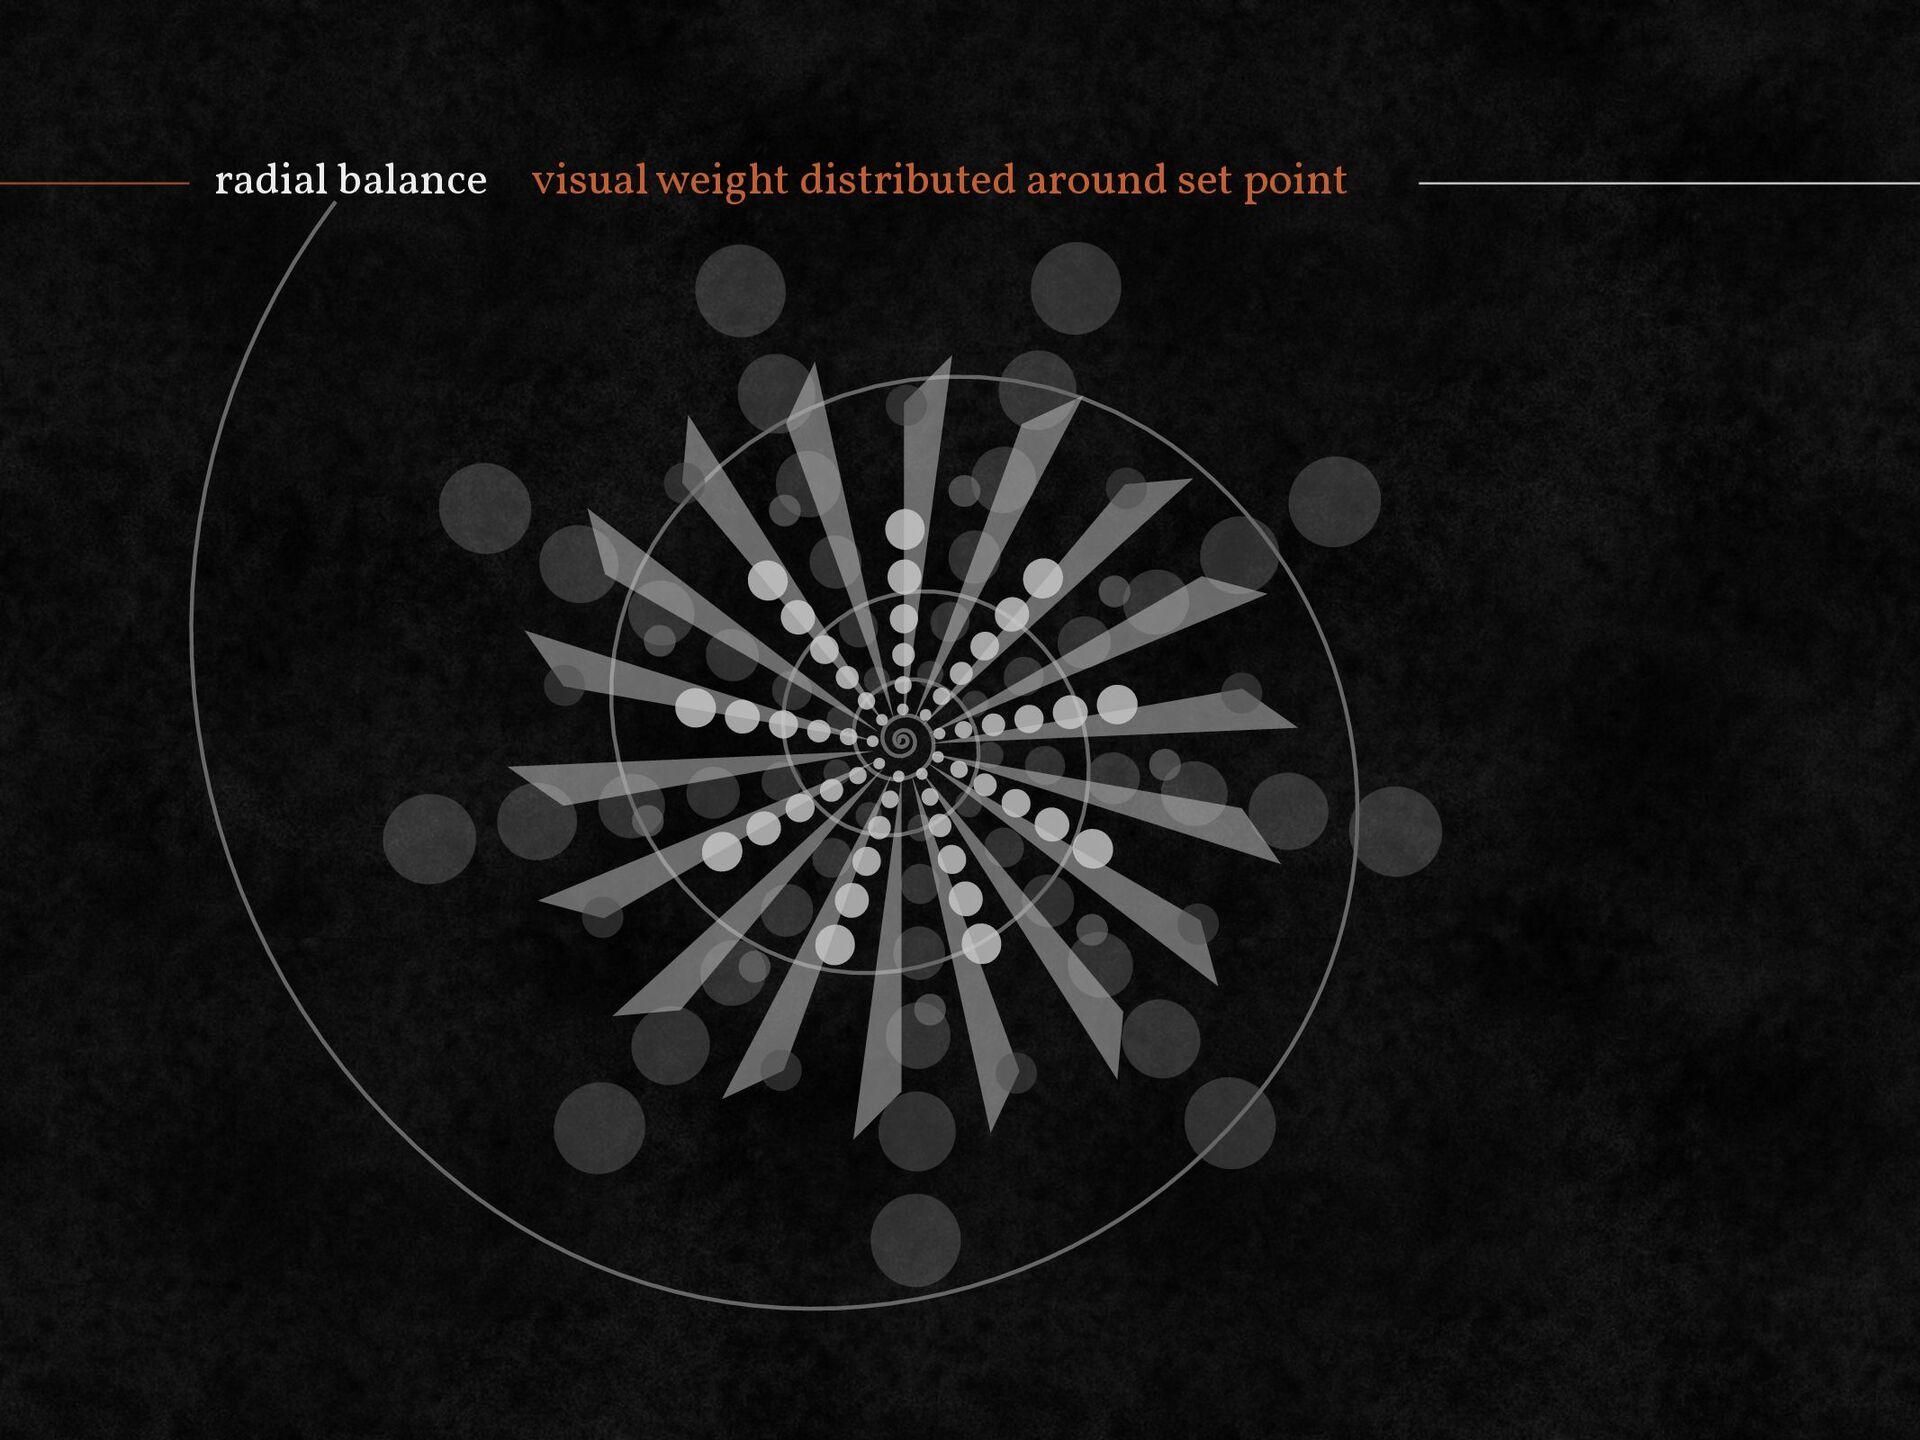 radial balance visual weight distributed around...